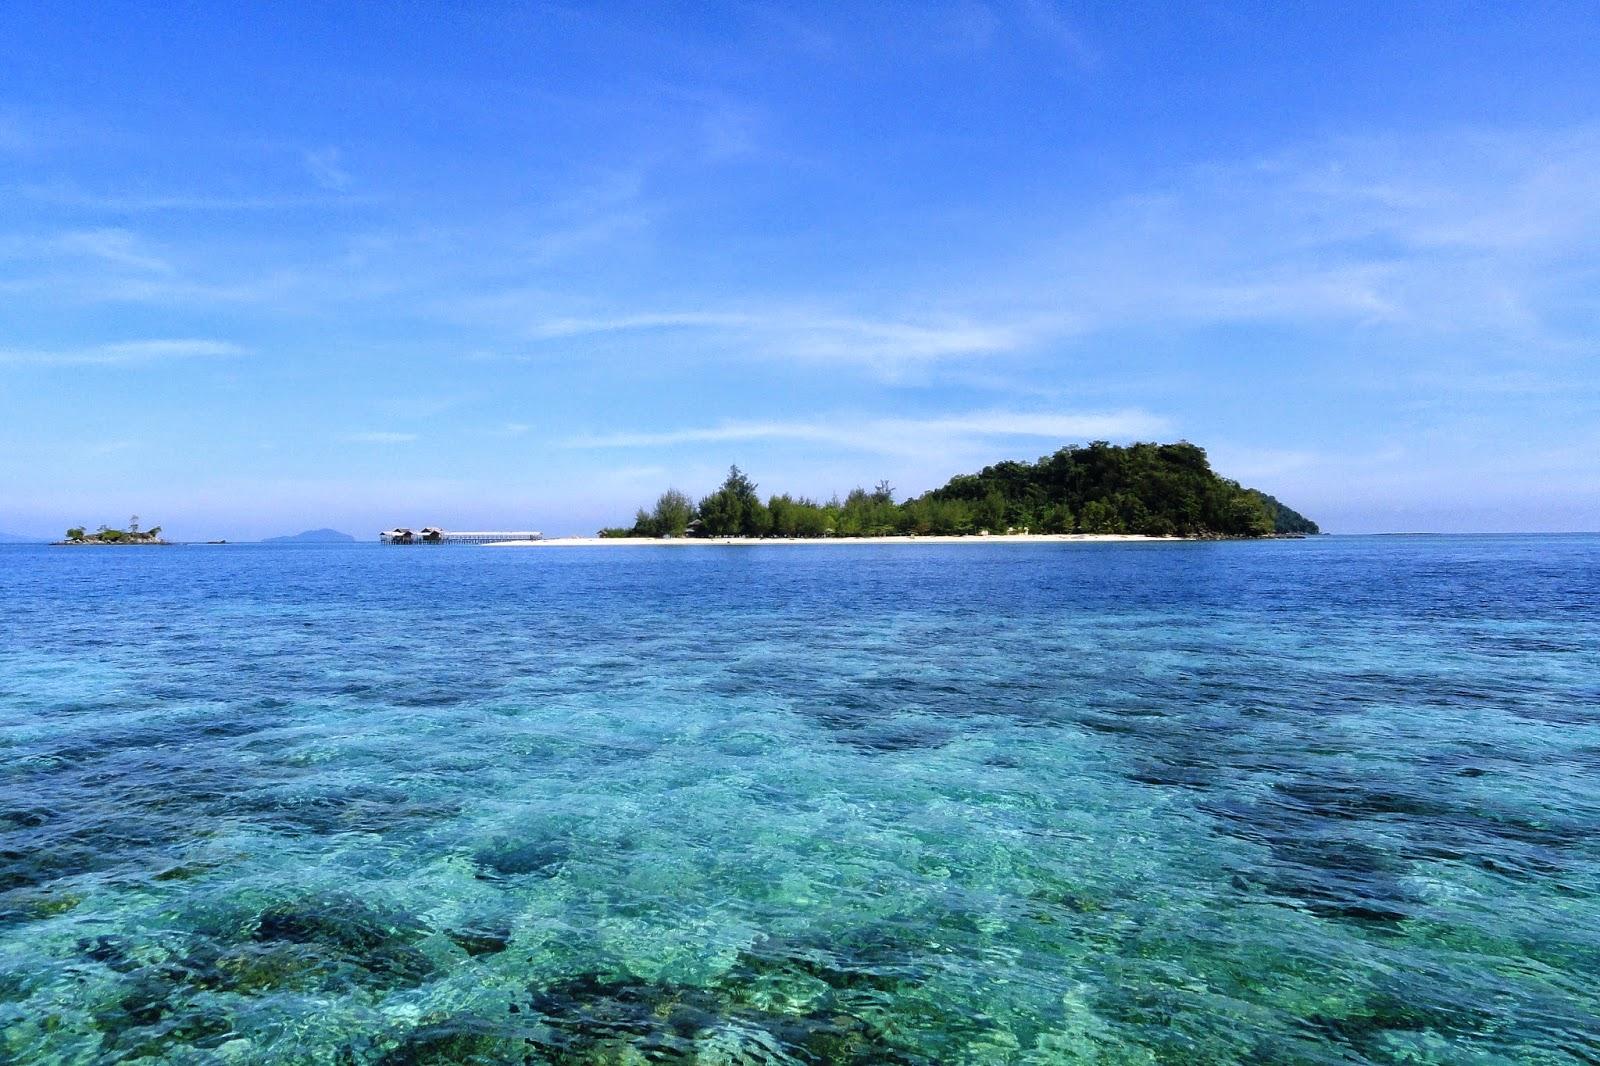 Wahyuddin Kessa Pulau Saronde Surga Bibir Pacific Kab Gorontalo Utara